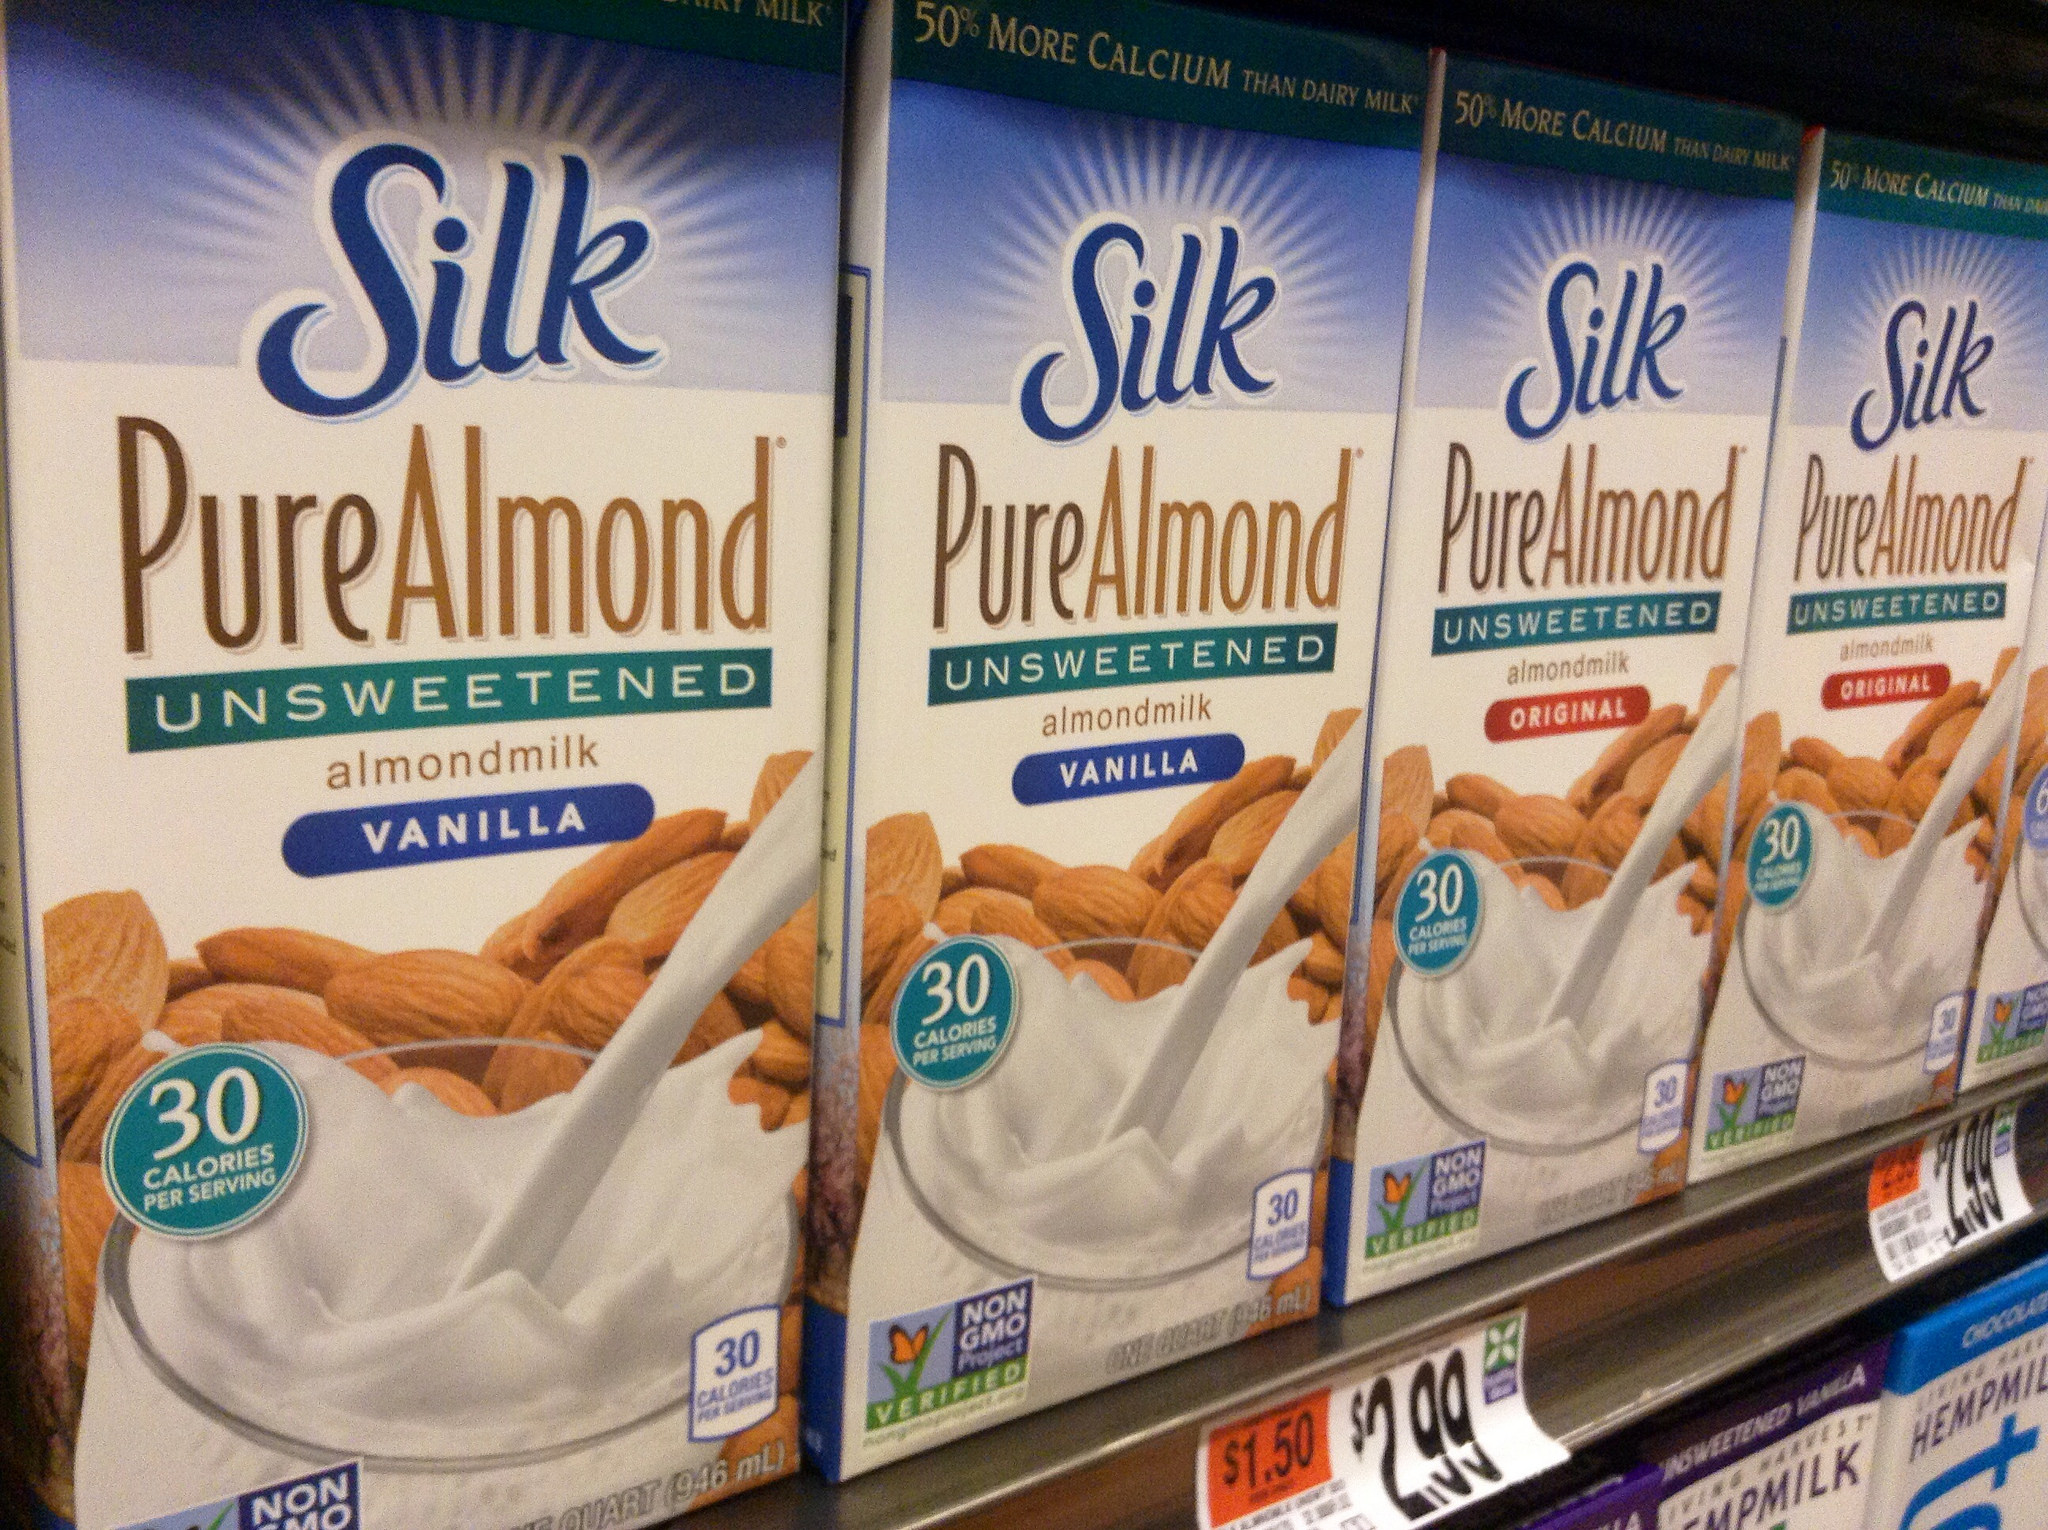 silkalmond2